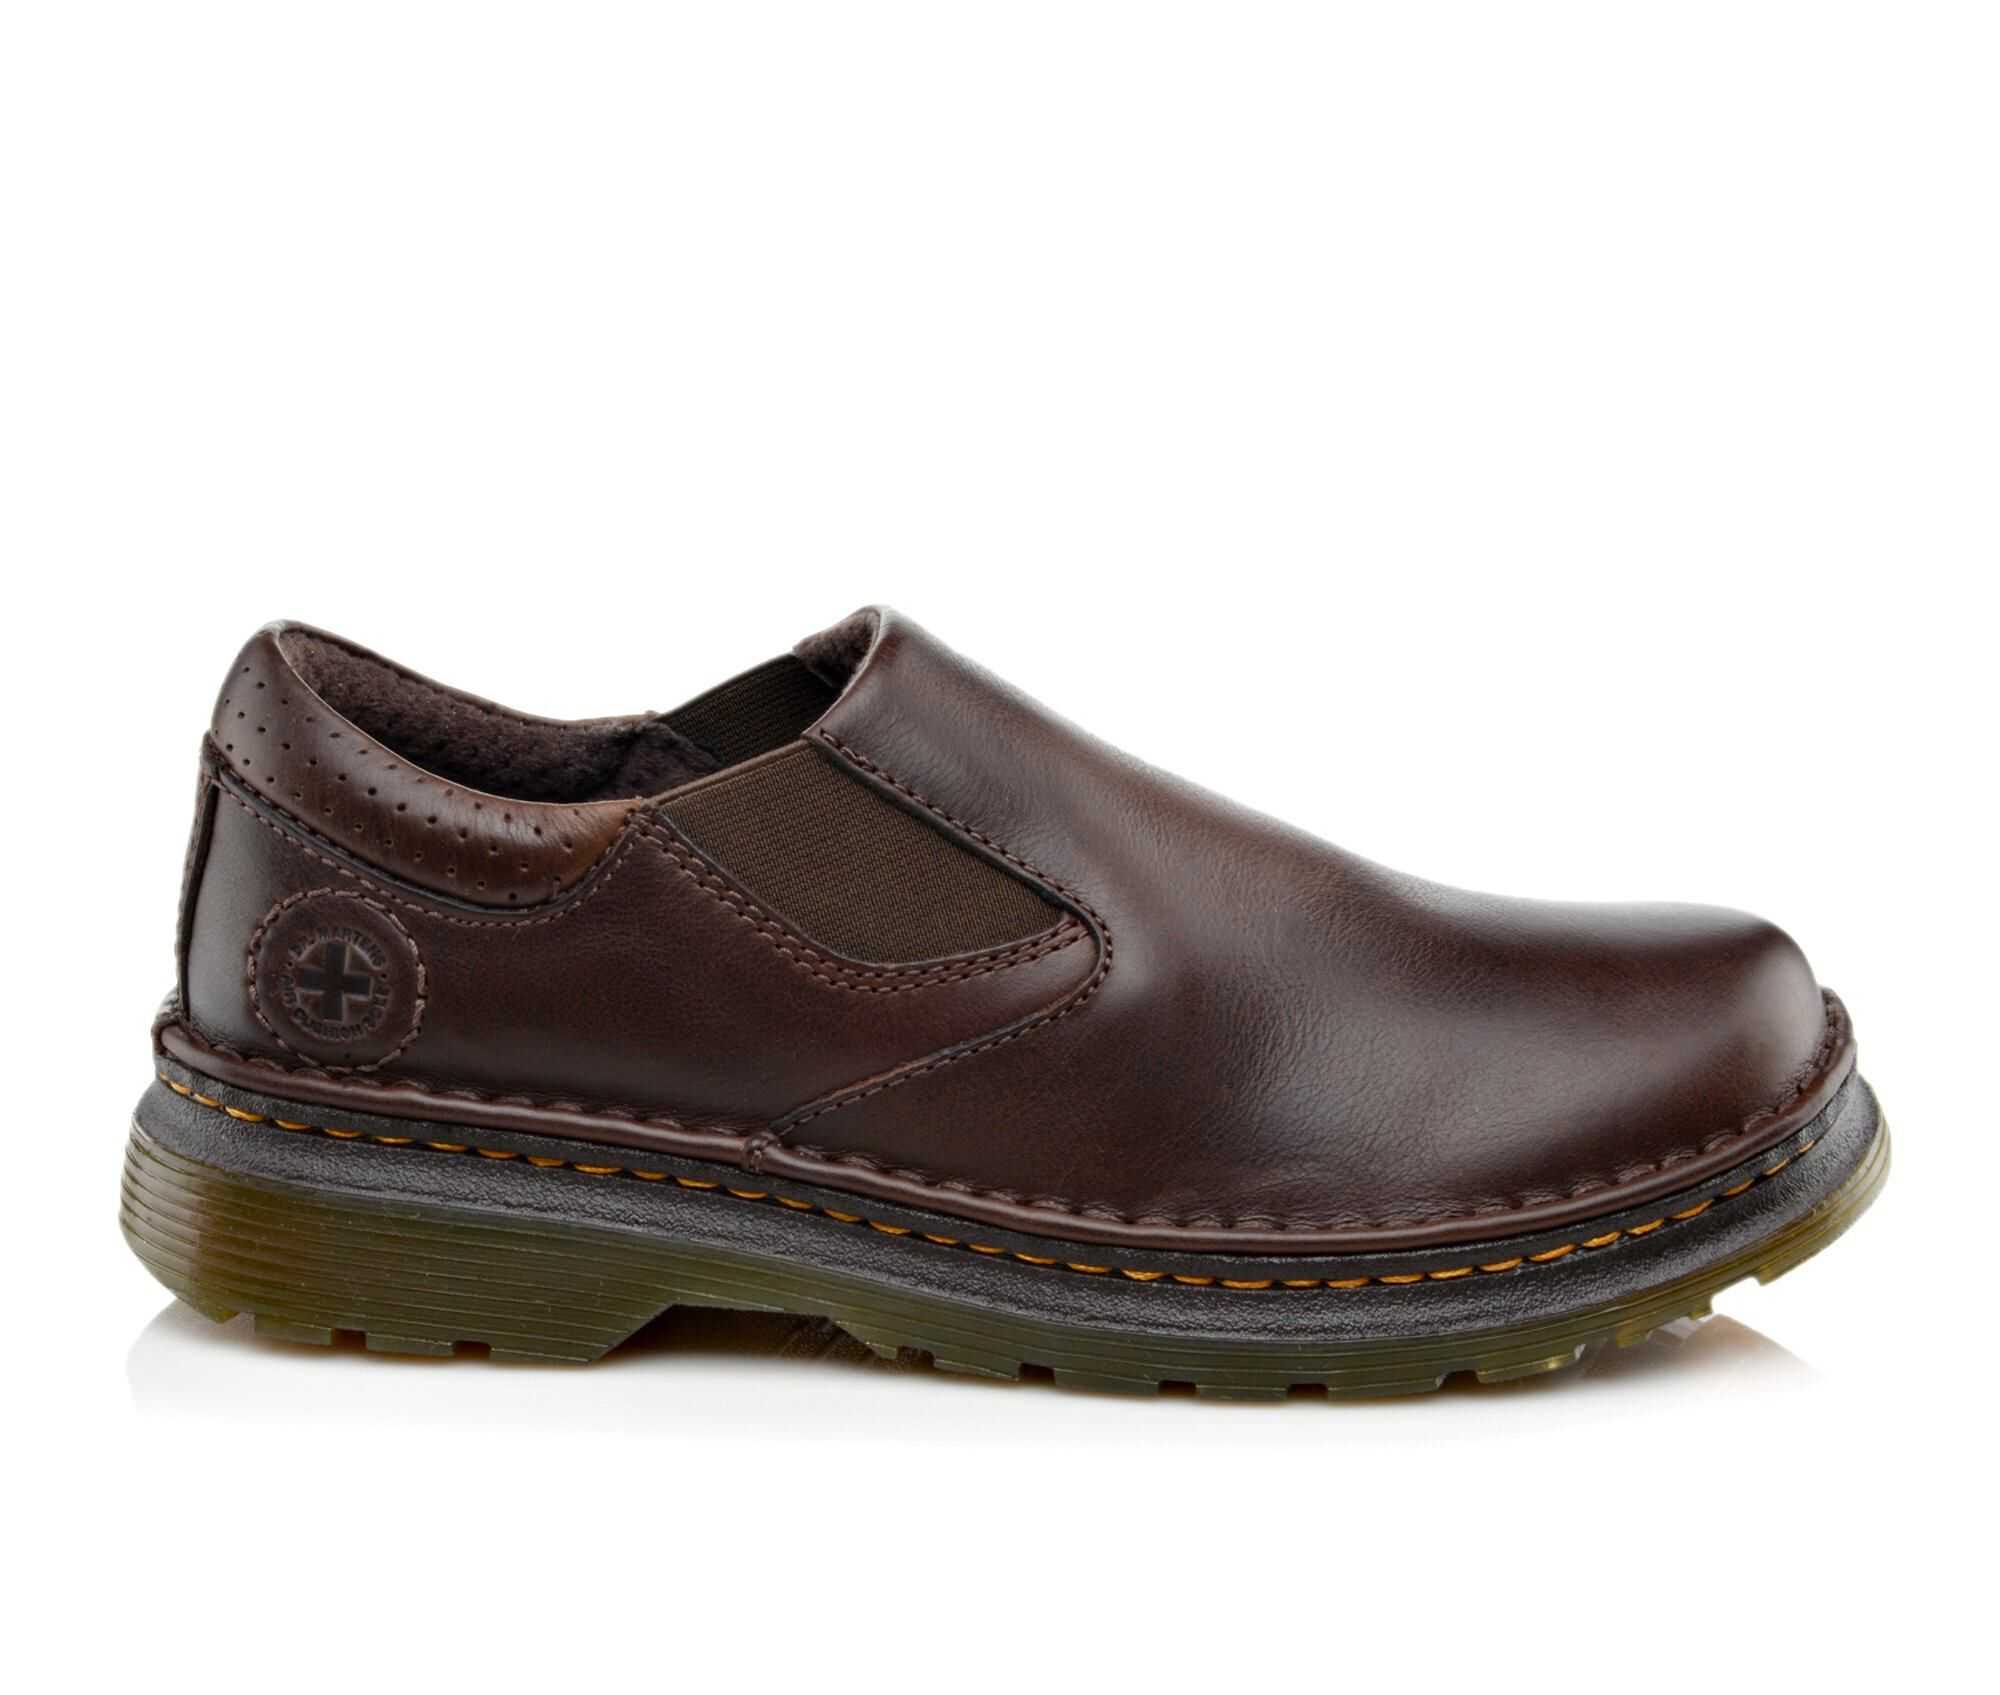 Men's Dr. Martens Orson Slip On Plain Toe Loafers Dark Brown